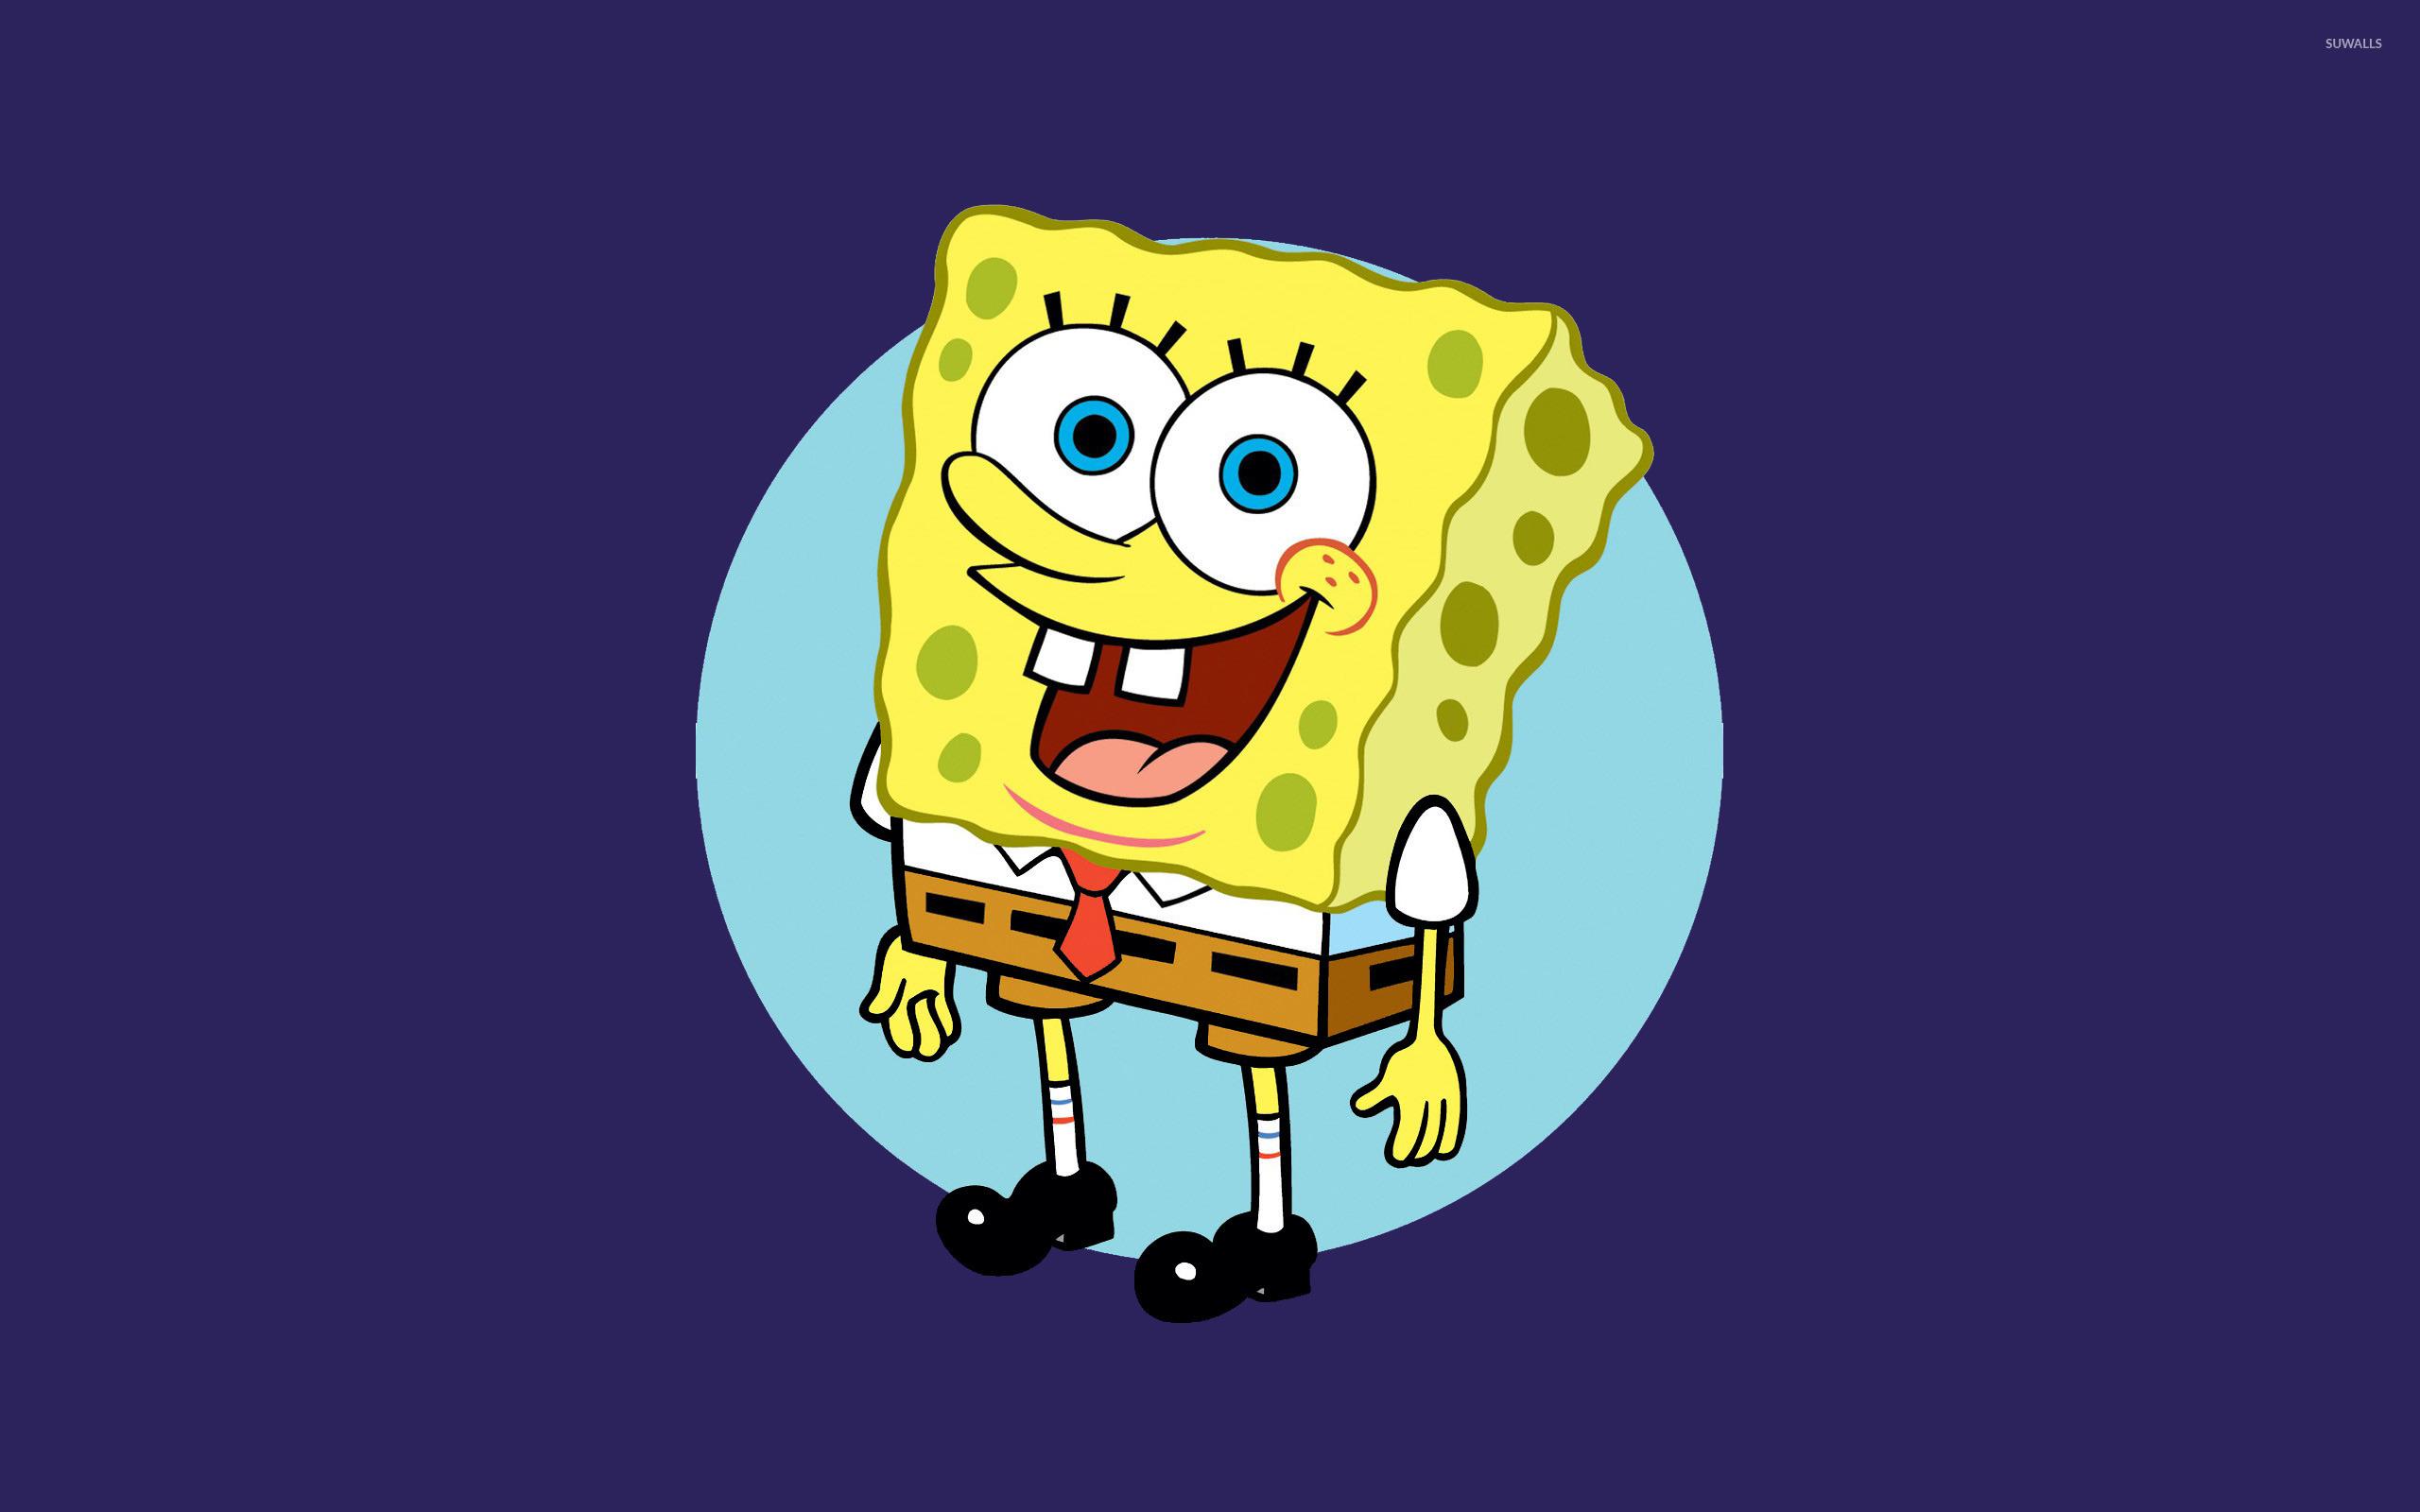 spongebob squarepants 11561